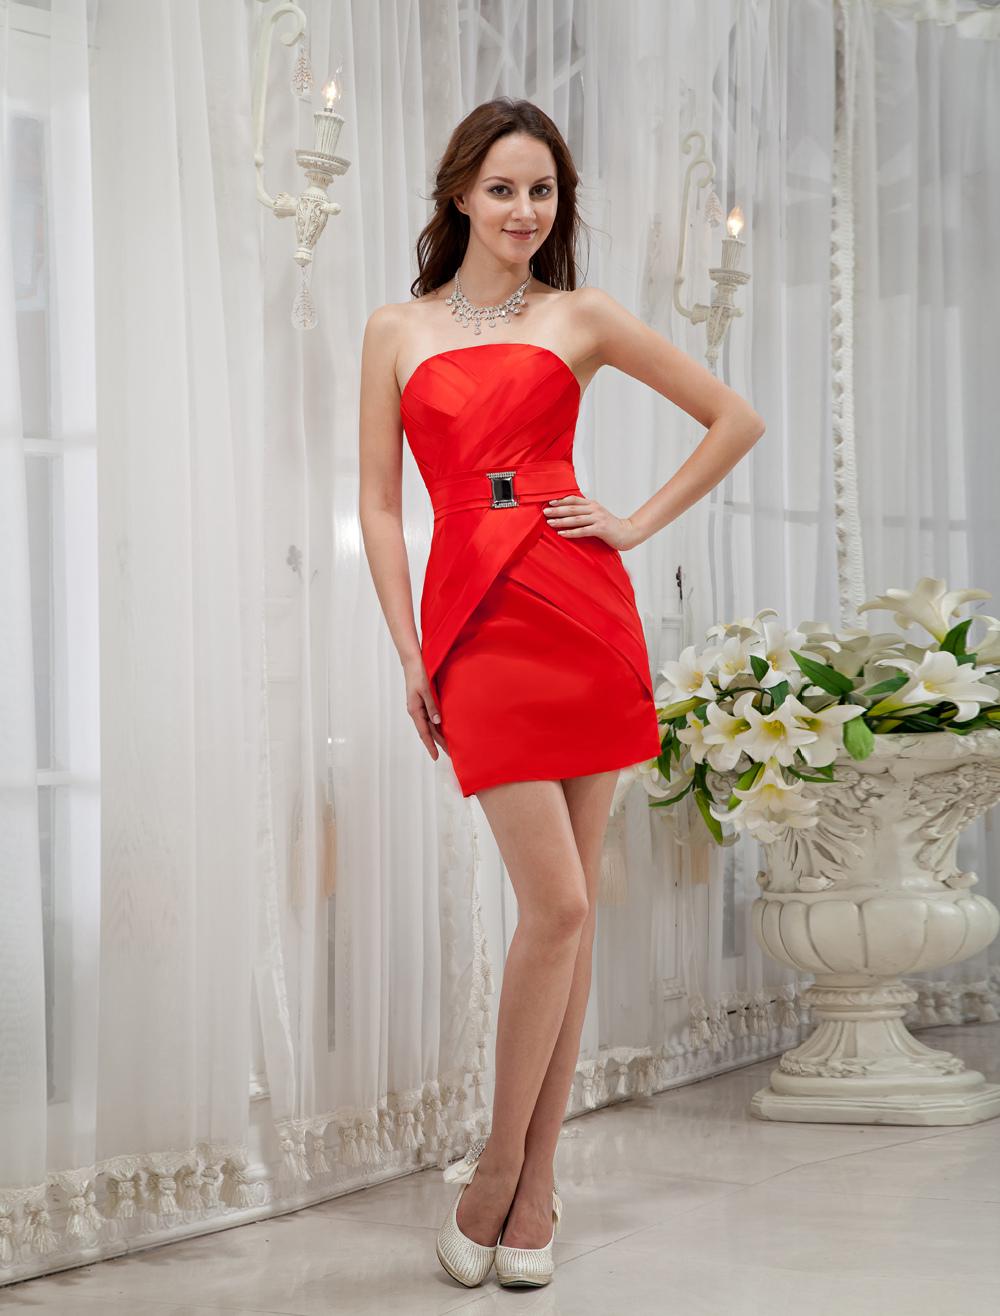 Red Strapless Sheath Rhinestone Satin Cocktail Dress (Wedding Cheap Party Dress) photo